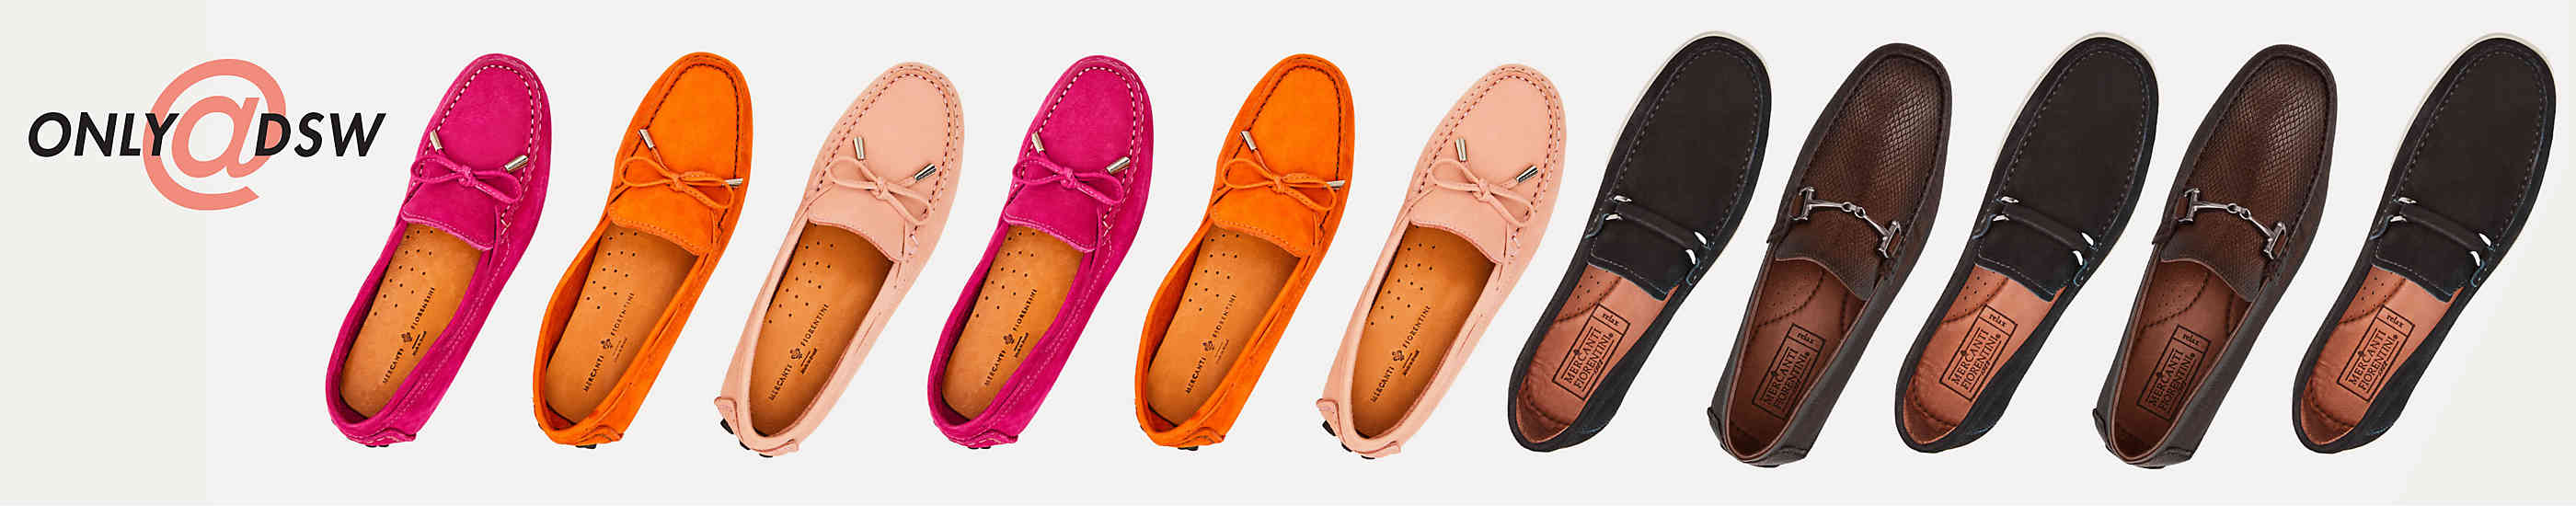 884107ebd603 Mercanti Fiorentini Shoes